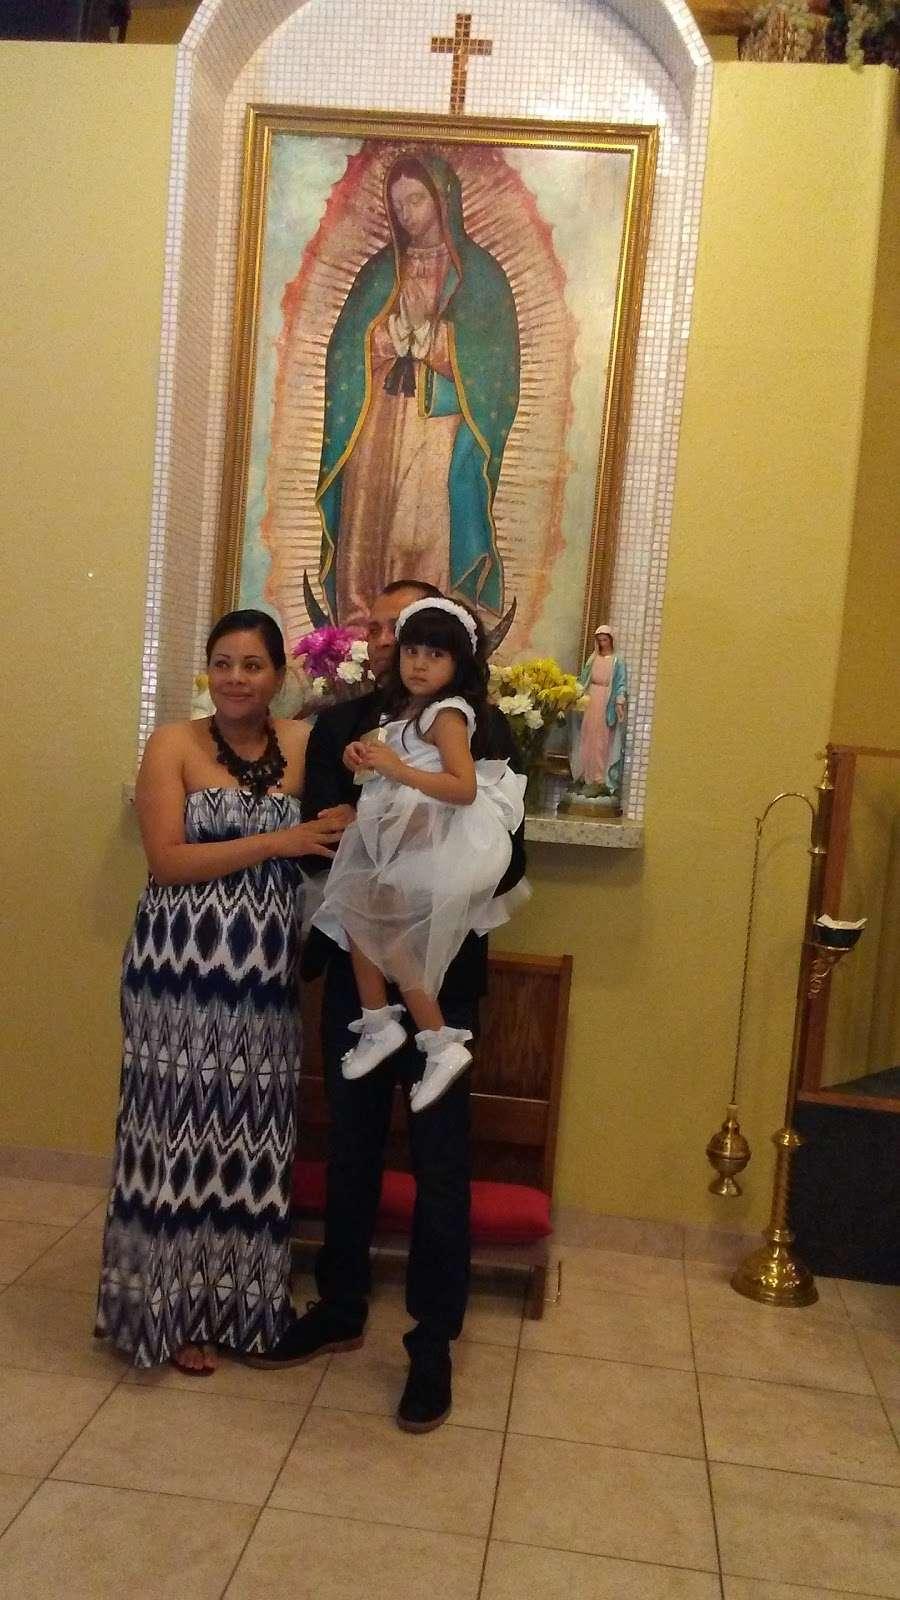 Saint Williams Catholic Church - church    Photo 8 of 9   Address: 11025 W 3rd St, Cashion, AZ 85329, USA   Phone: (623) 936-6115